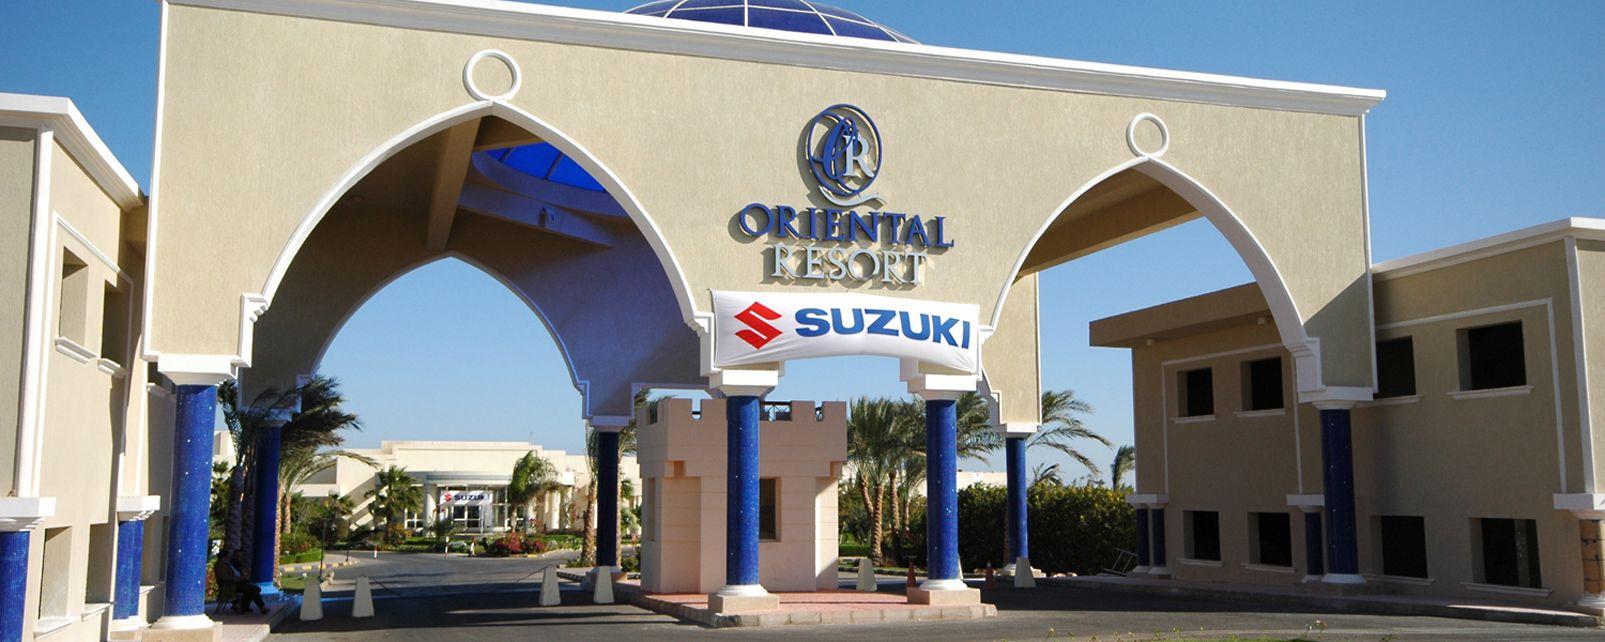 Hôtel Hostmark Oriental Resort